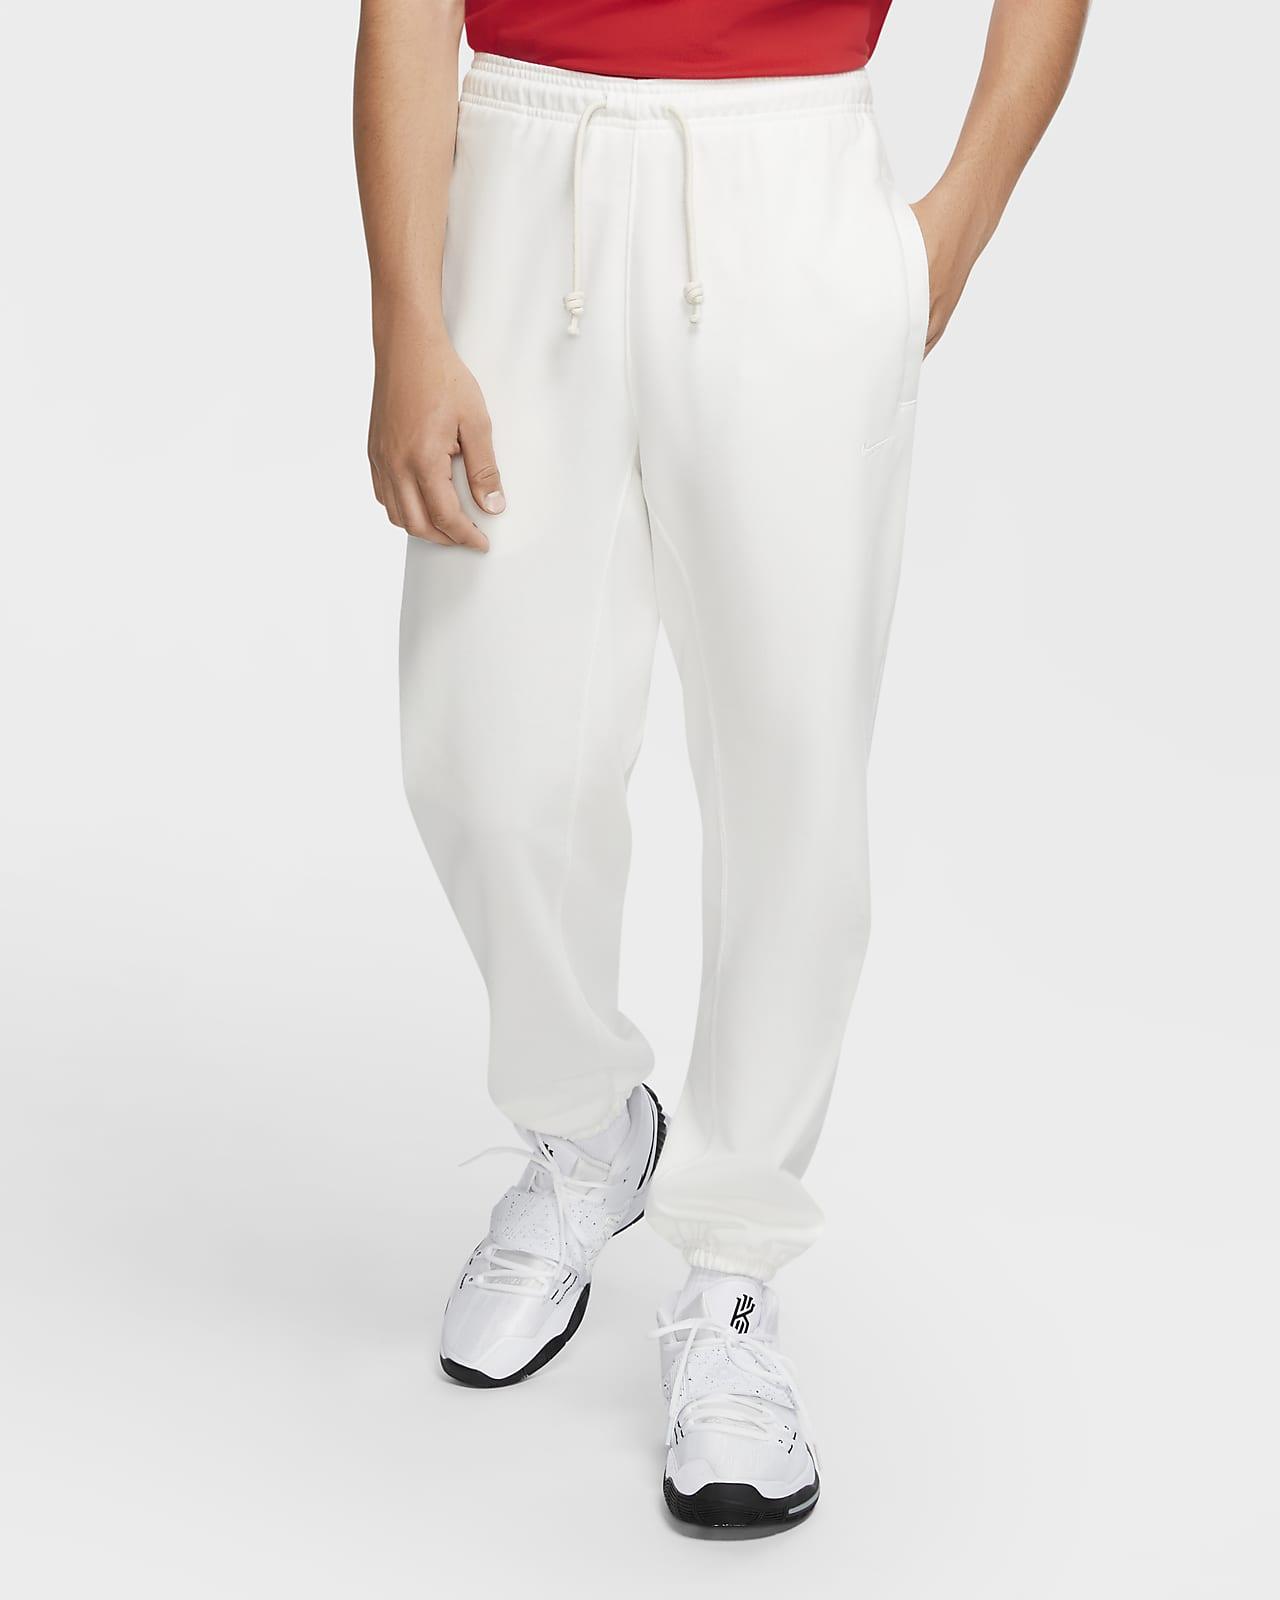 quemado Arcaico Desilusión  Nike Dri-FIT Standard Issue Men's Basketball Pants. Nike.com